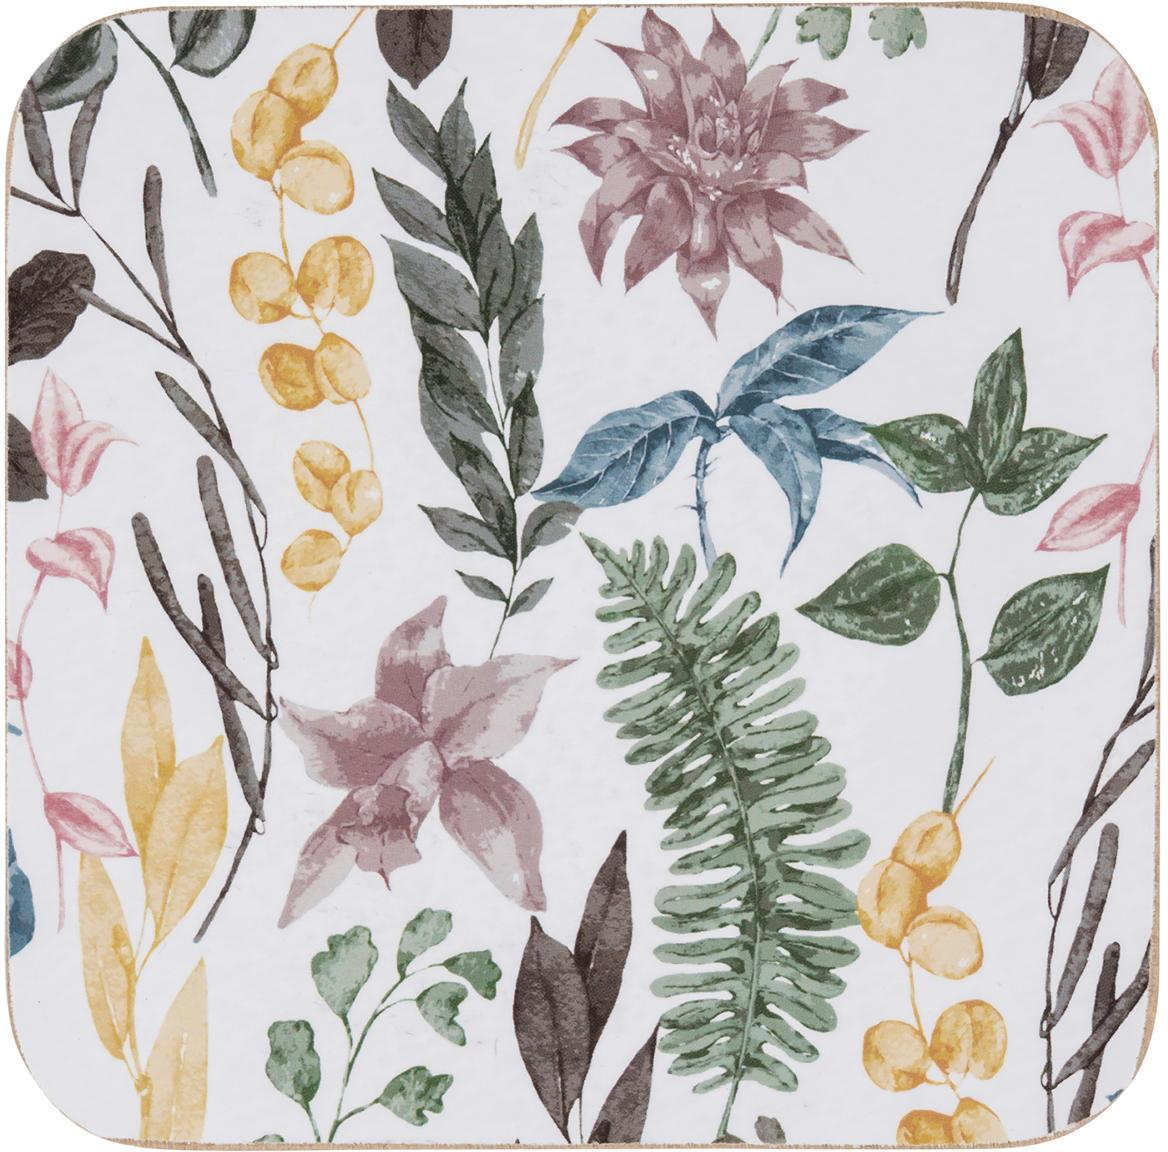 Onderzetters Summerfield, 4 stuks, MDF, kurk, Wit, multicolour, B 10 x D 10 cm